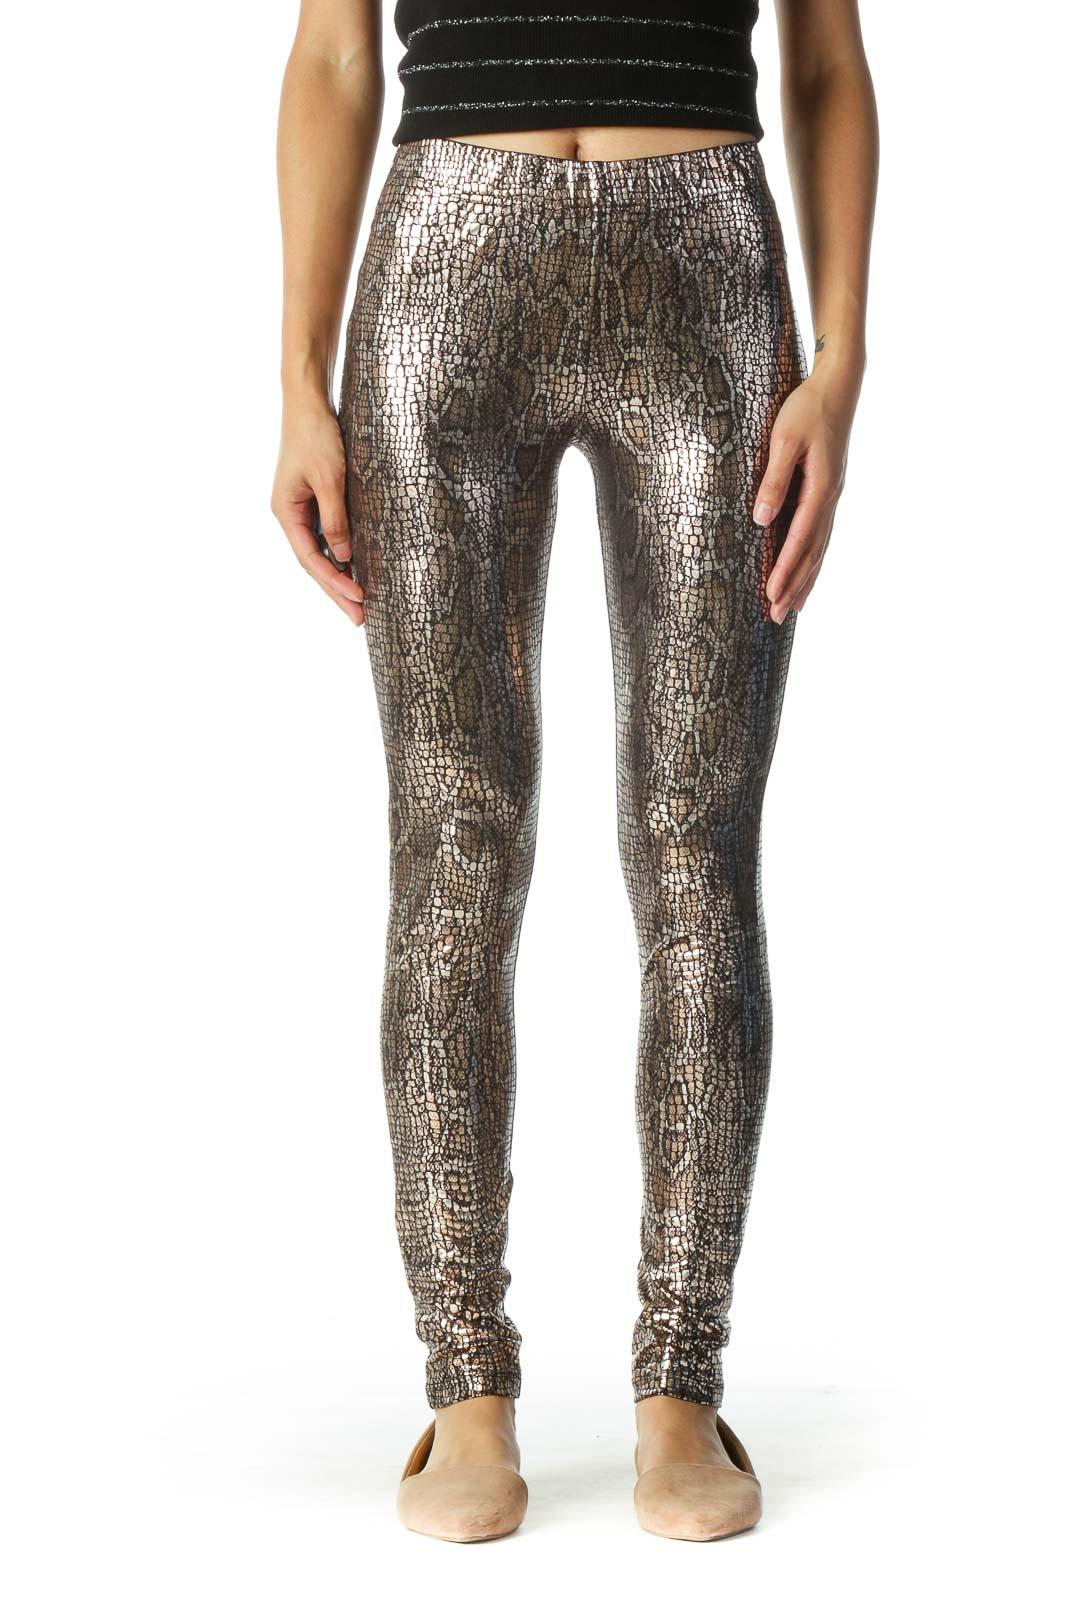 Black and Gold Metallic Print Leggings Front